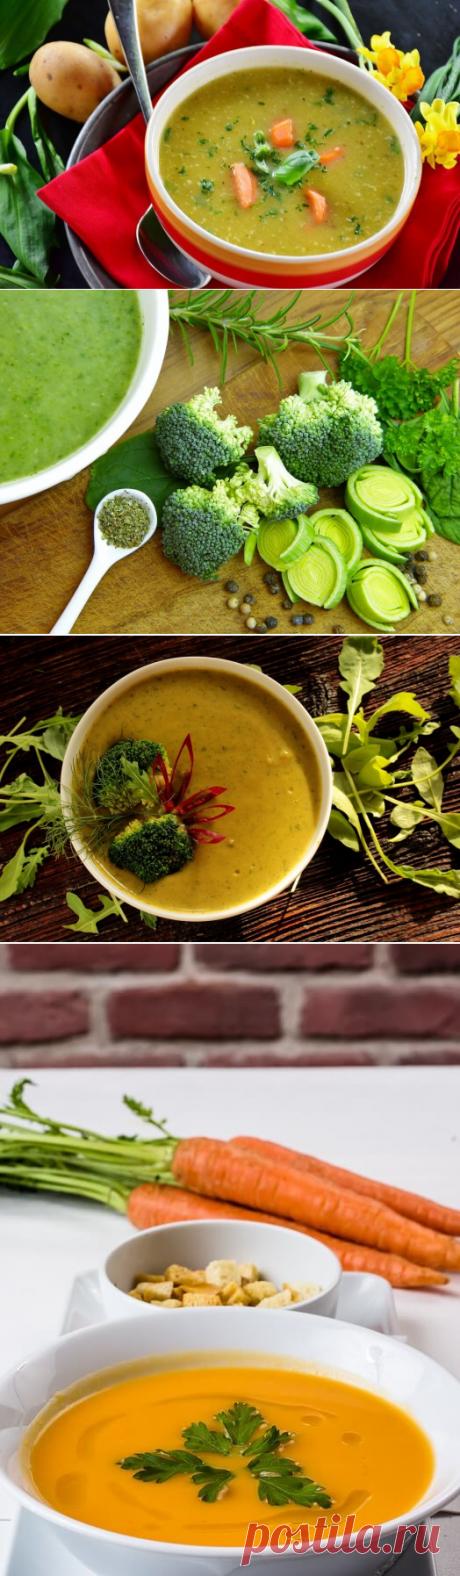 Суп-чистка против жира на животе: 3 рецепта на 3 дня | SimpleSlim